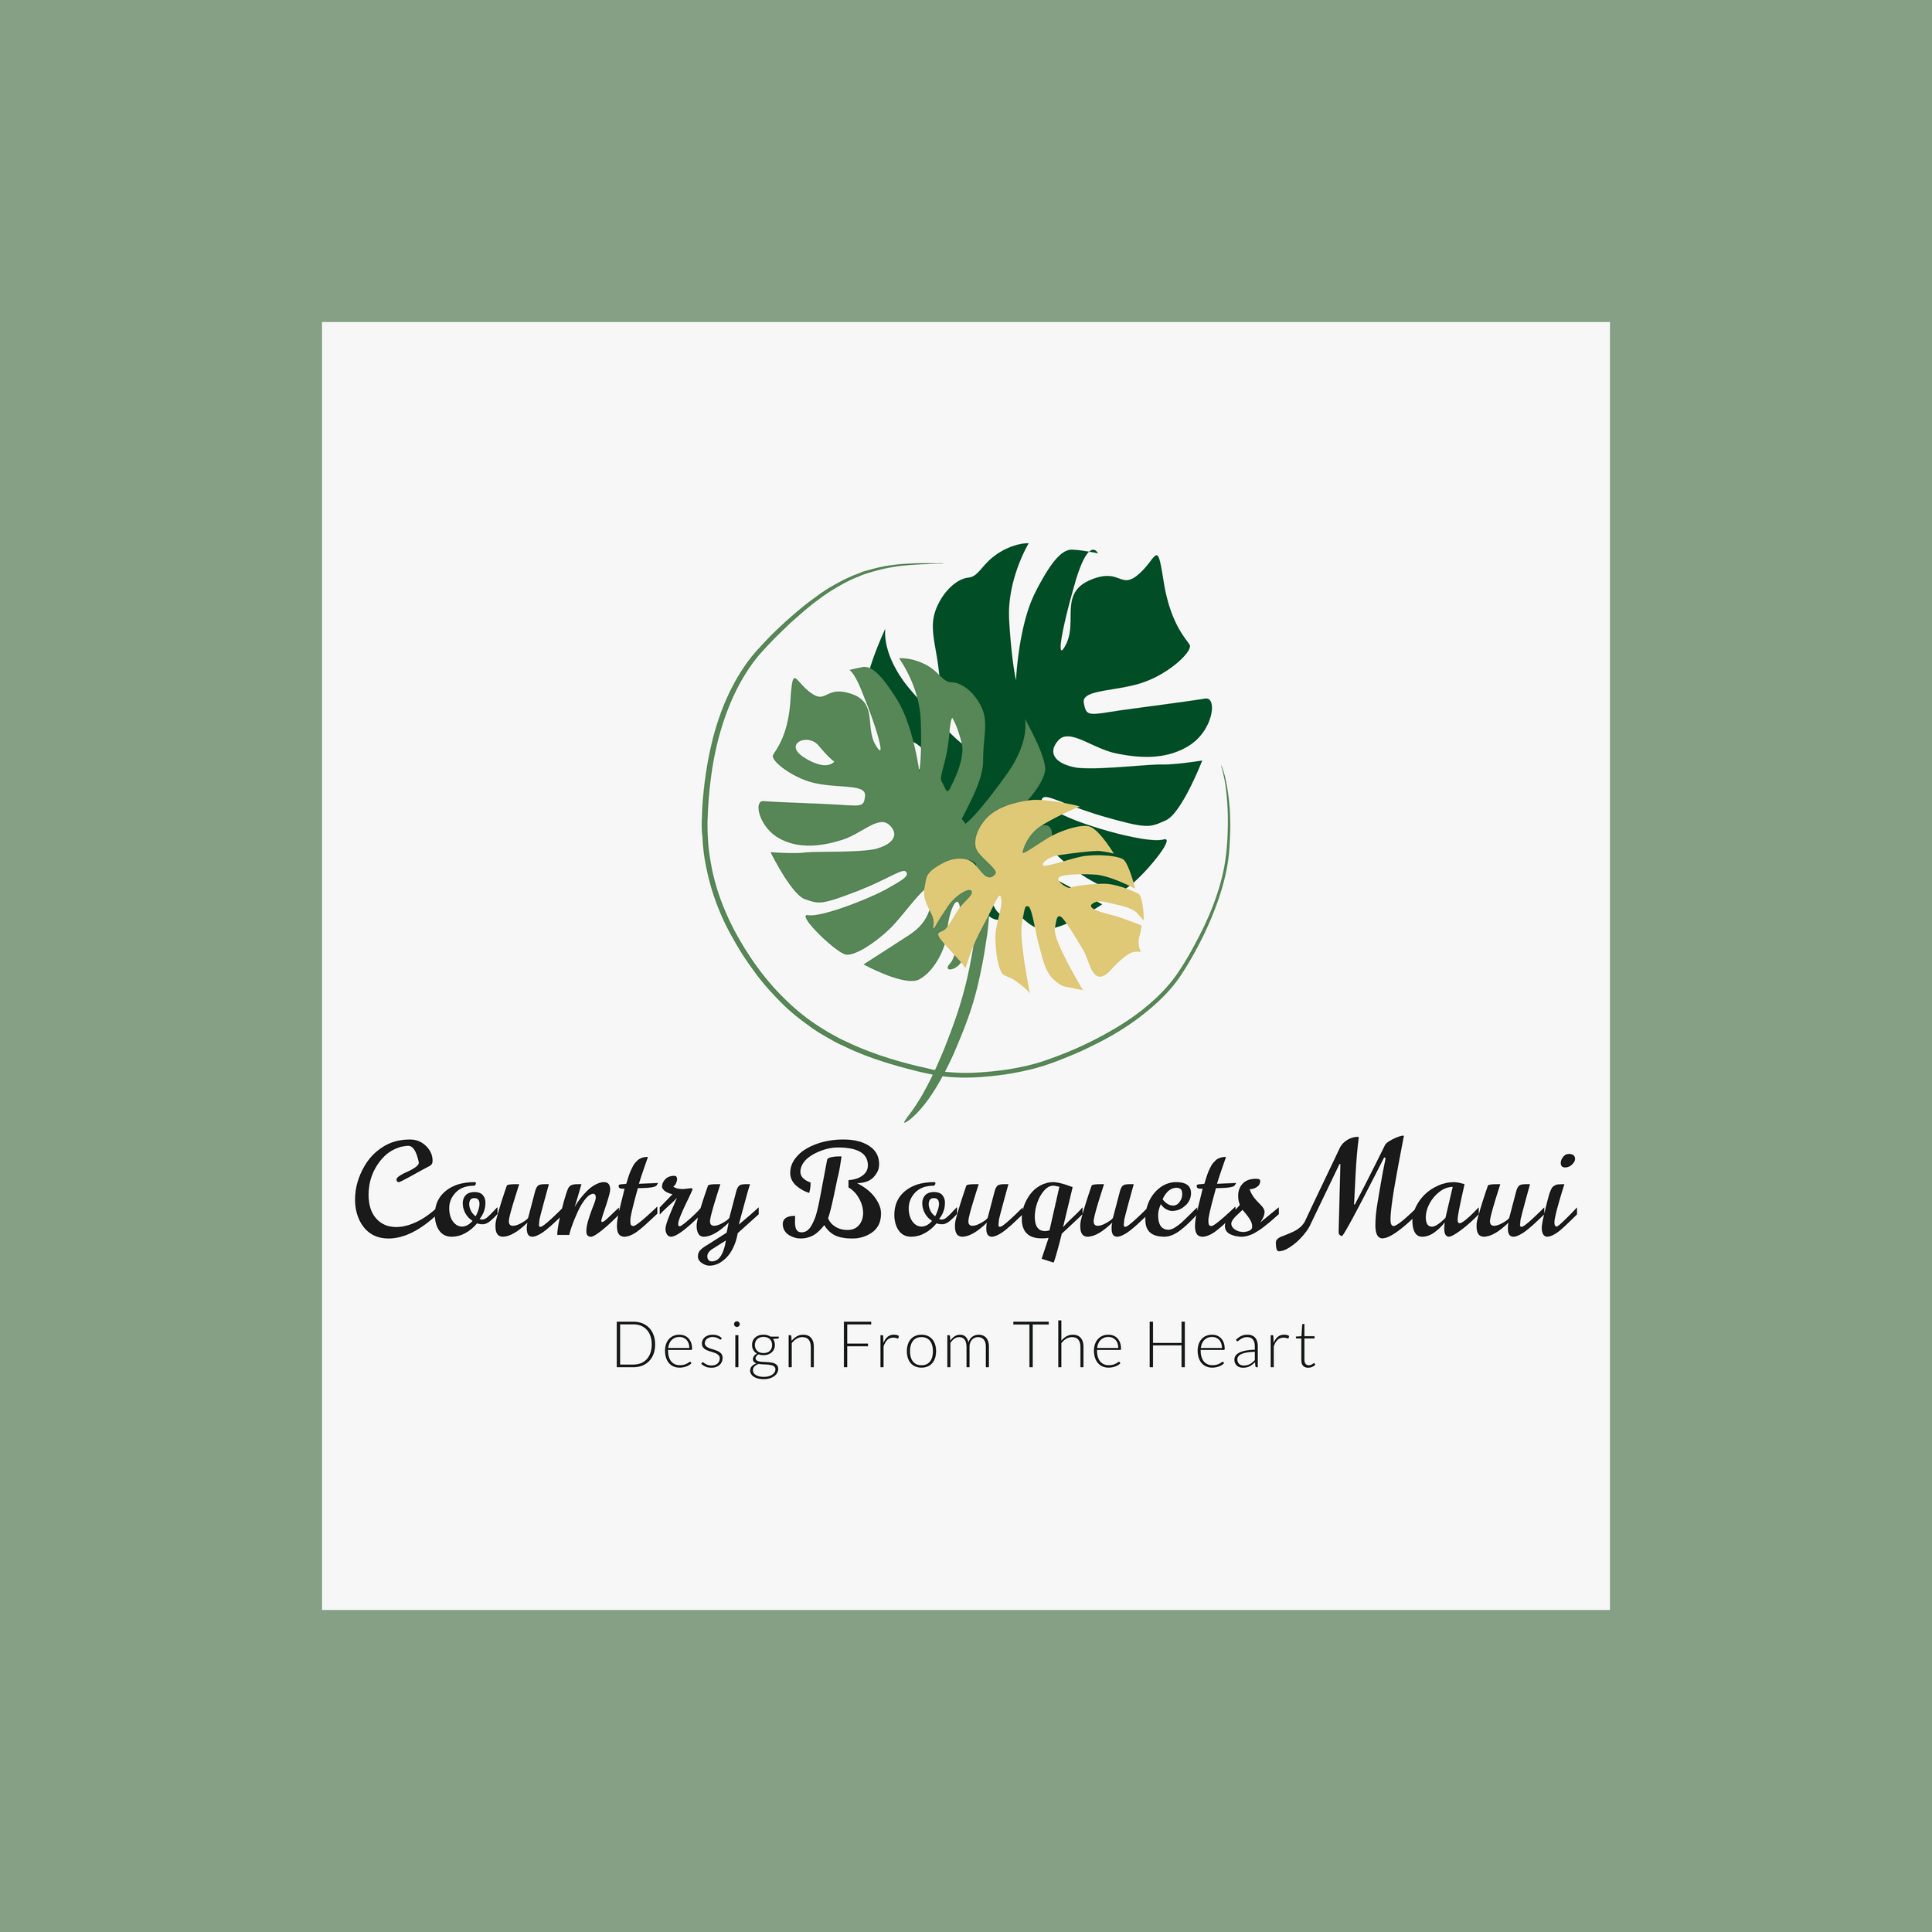 Country Bouquets Maui logo